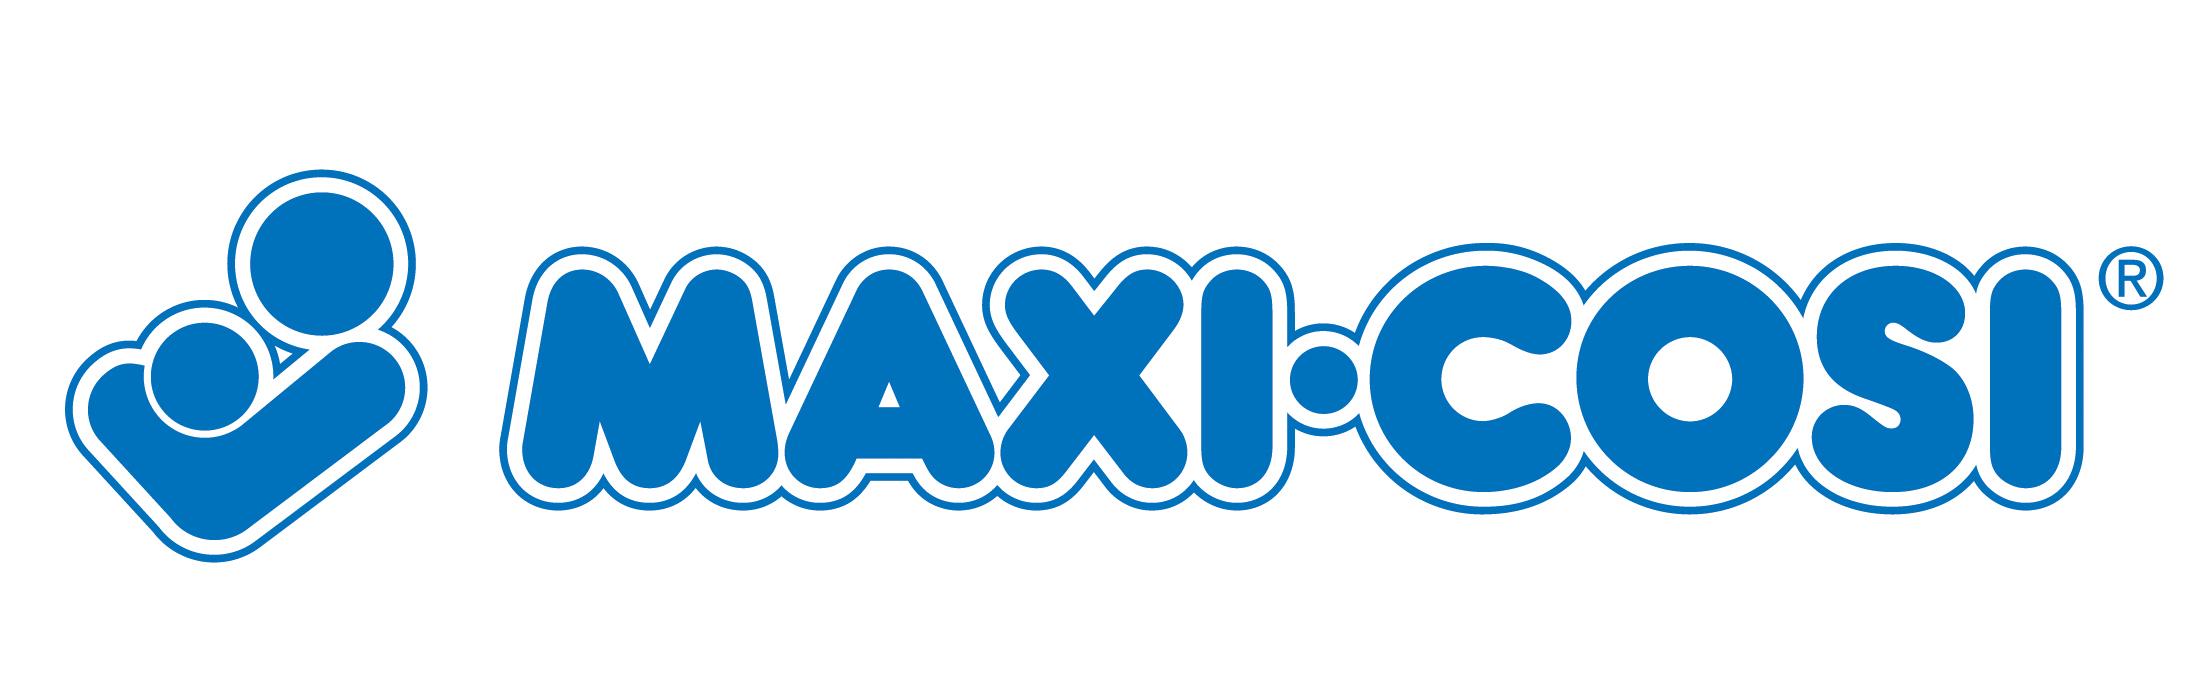 https://carseatblog.com/wp-content/uploads/2014/10/maxi-cosi-logo.jpg